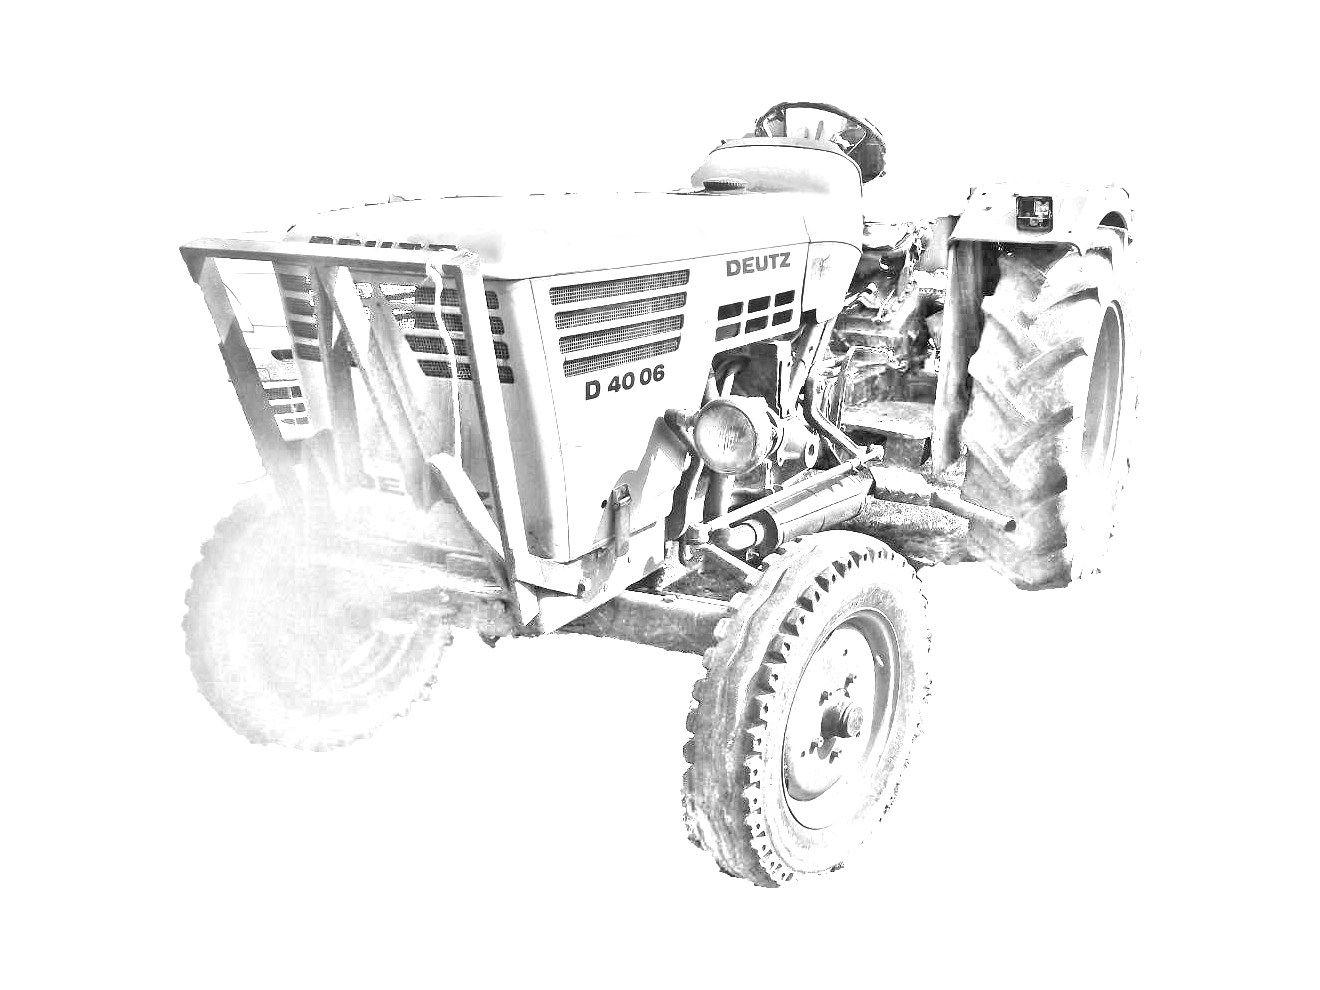 Ausmalbilder Traktor Deutz : Trattore Deutz Fahr D 40 06 Da Stampare E Colorare Vedi Le Immagini